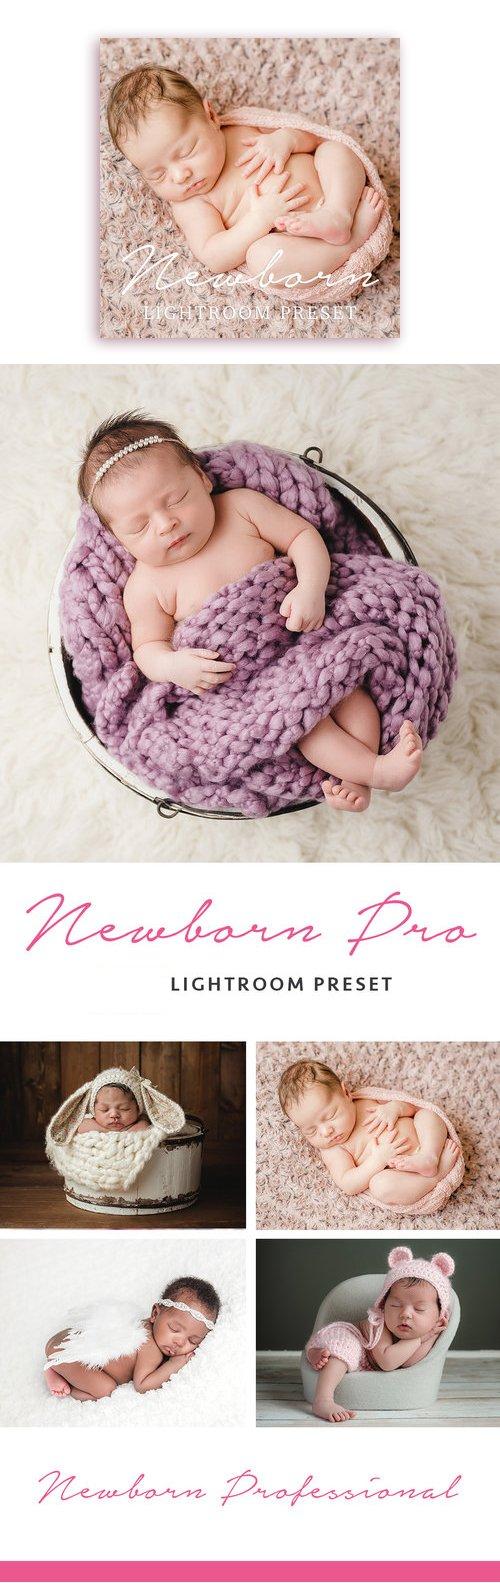 Creamy Skin - Newborn Baby Photography Lightroom Preset (Mobile & Desktop)